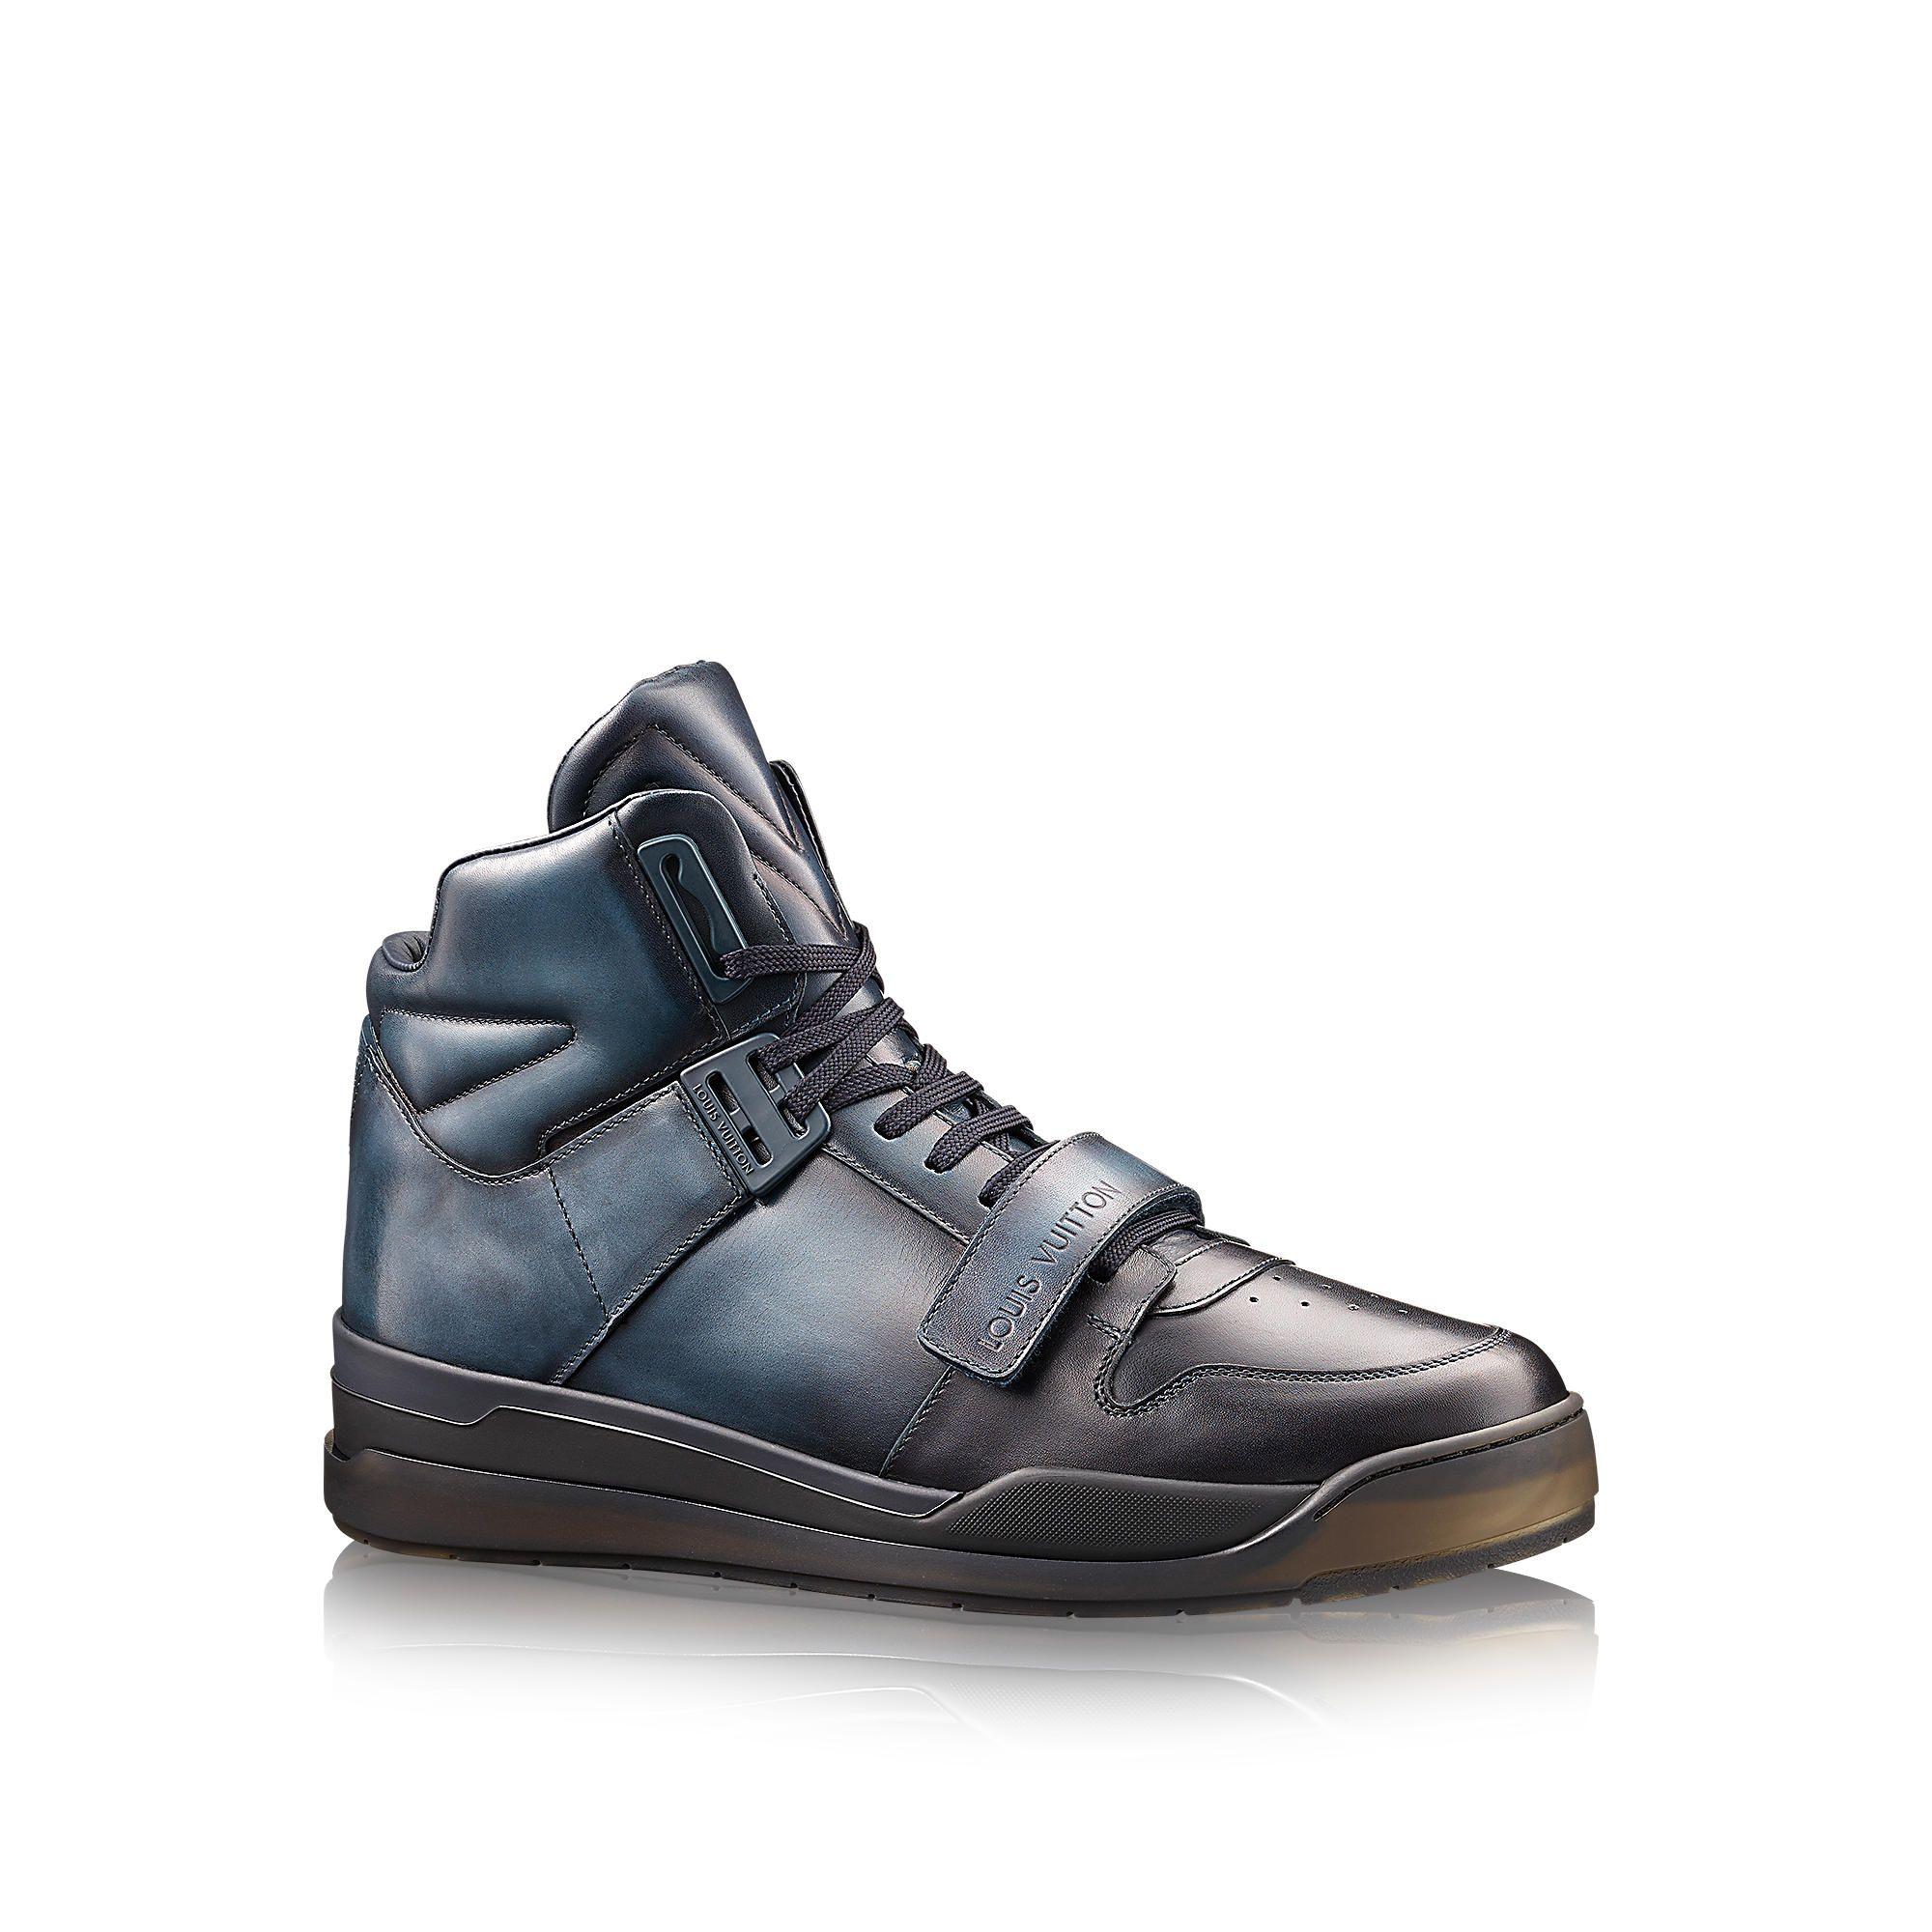 ecdeb2fa956f key product page share discover product Trailblazer Sneaker via Louis  Vuitton